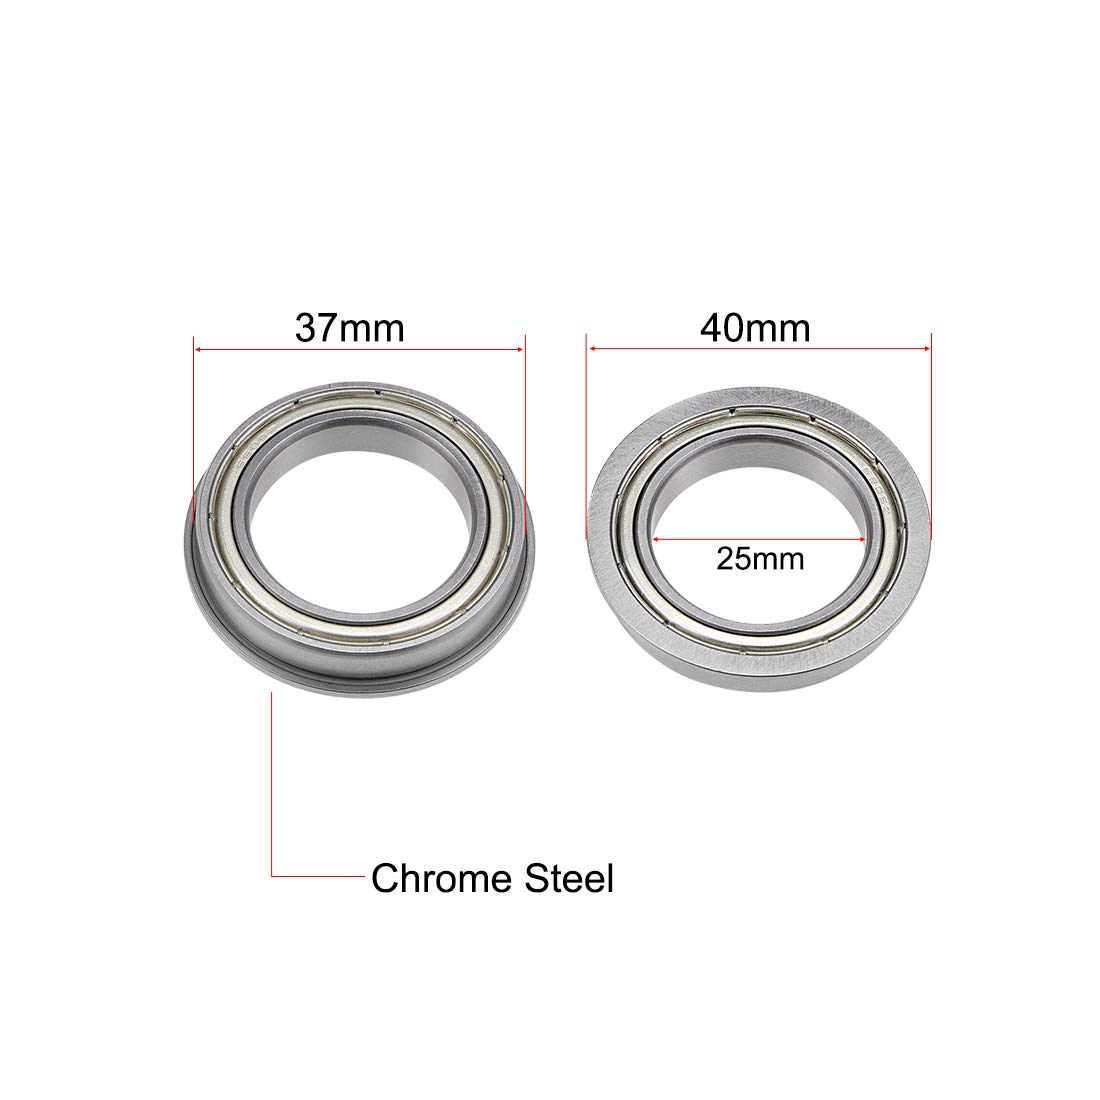 sourcing map F6700ZZ Flange Ball Bearing 10x15x4mm Shielded Chrome Bearings 5pcs